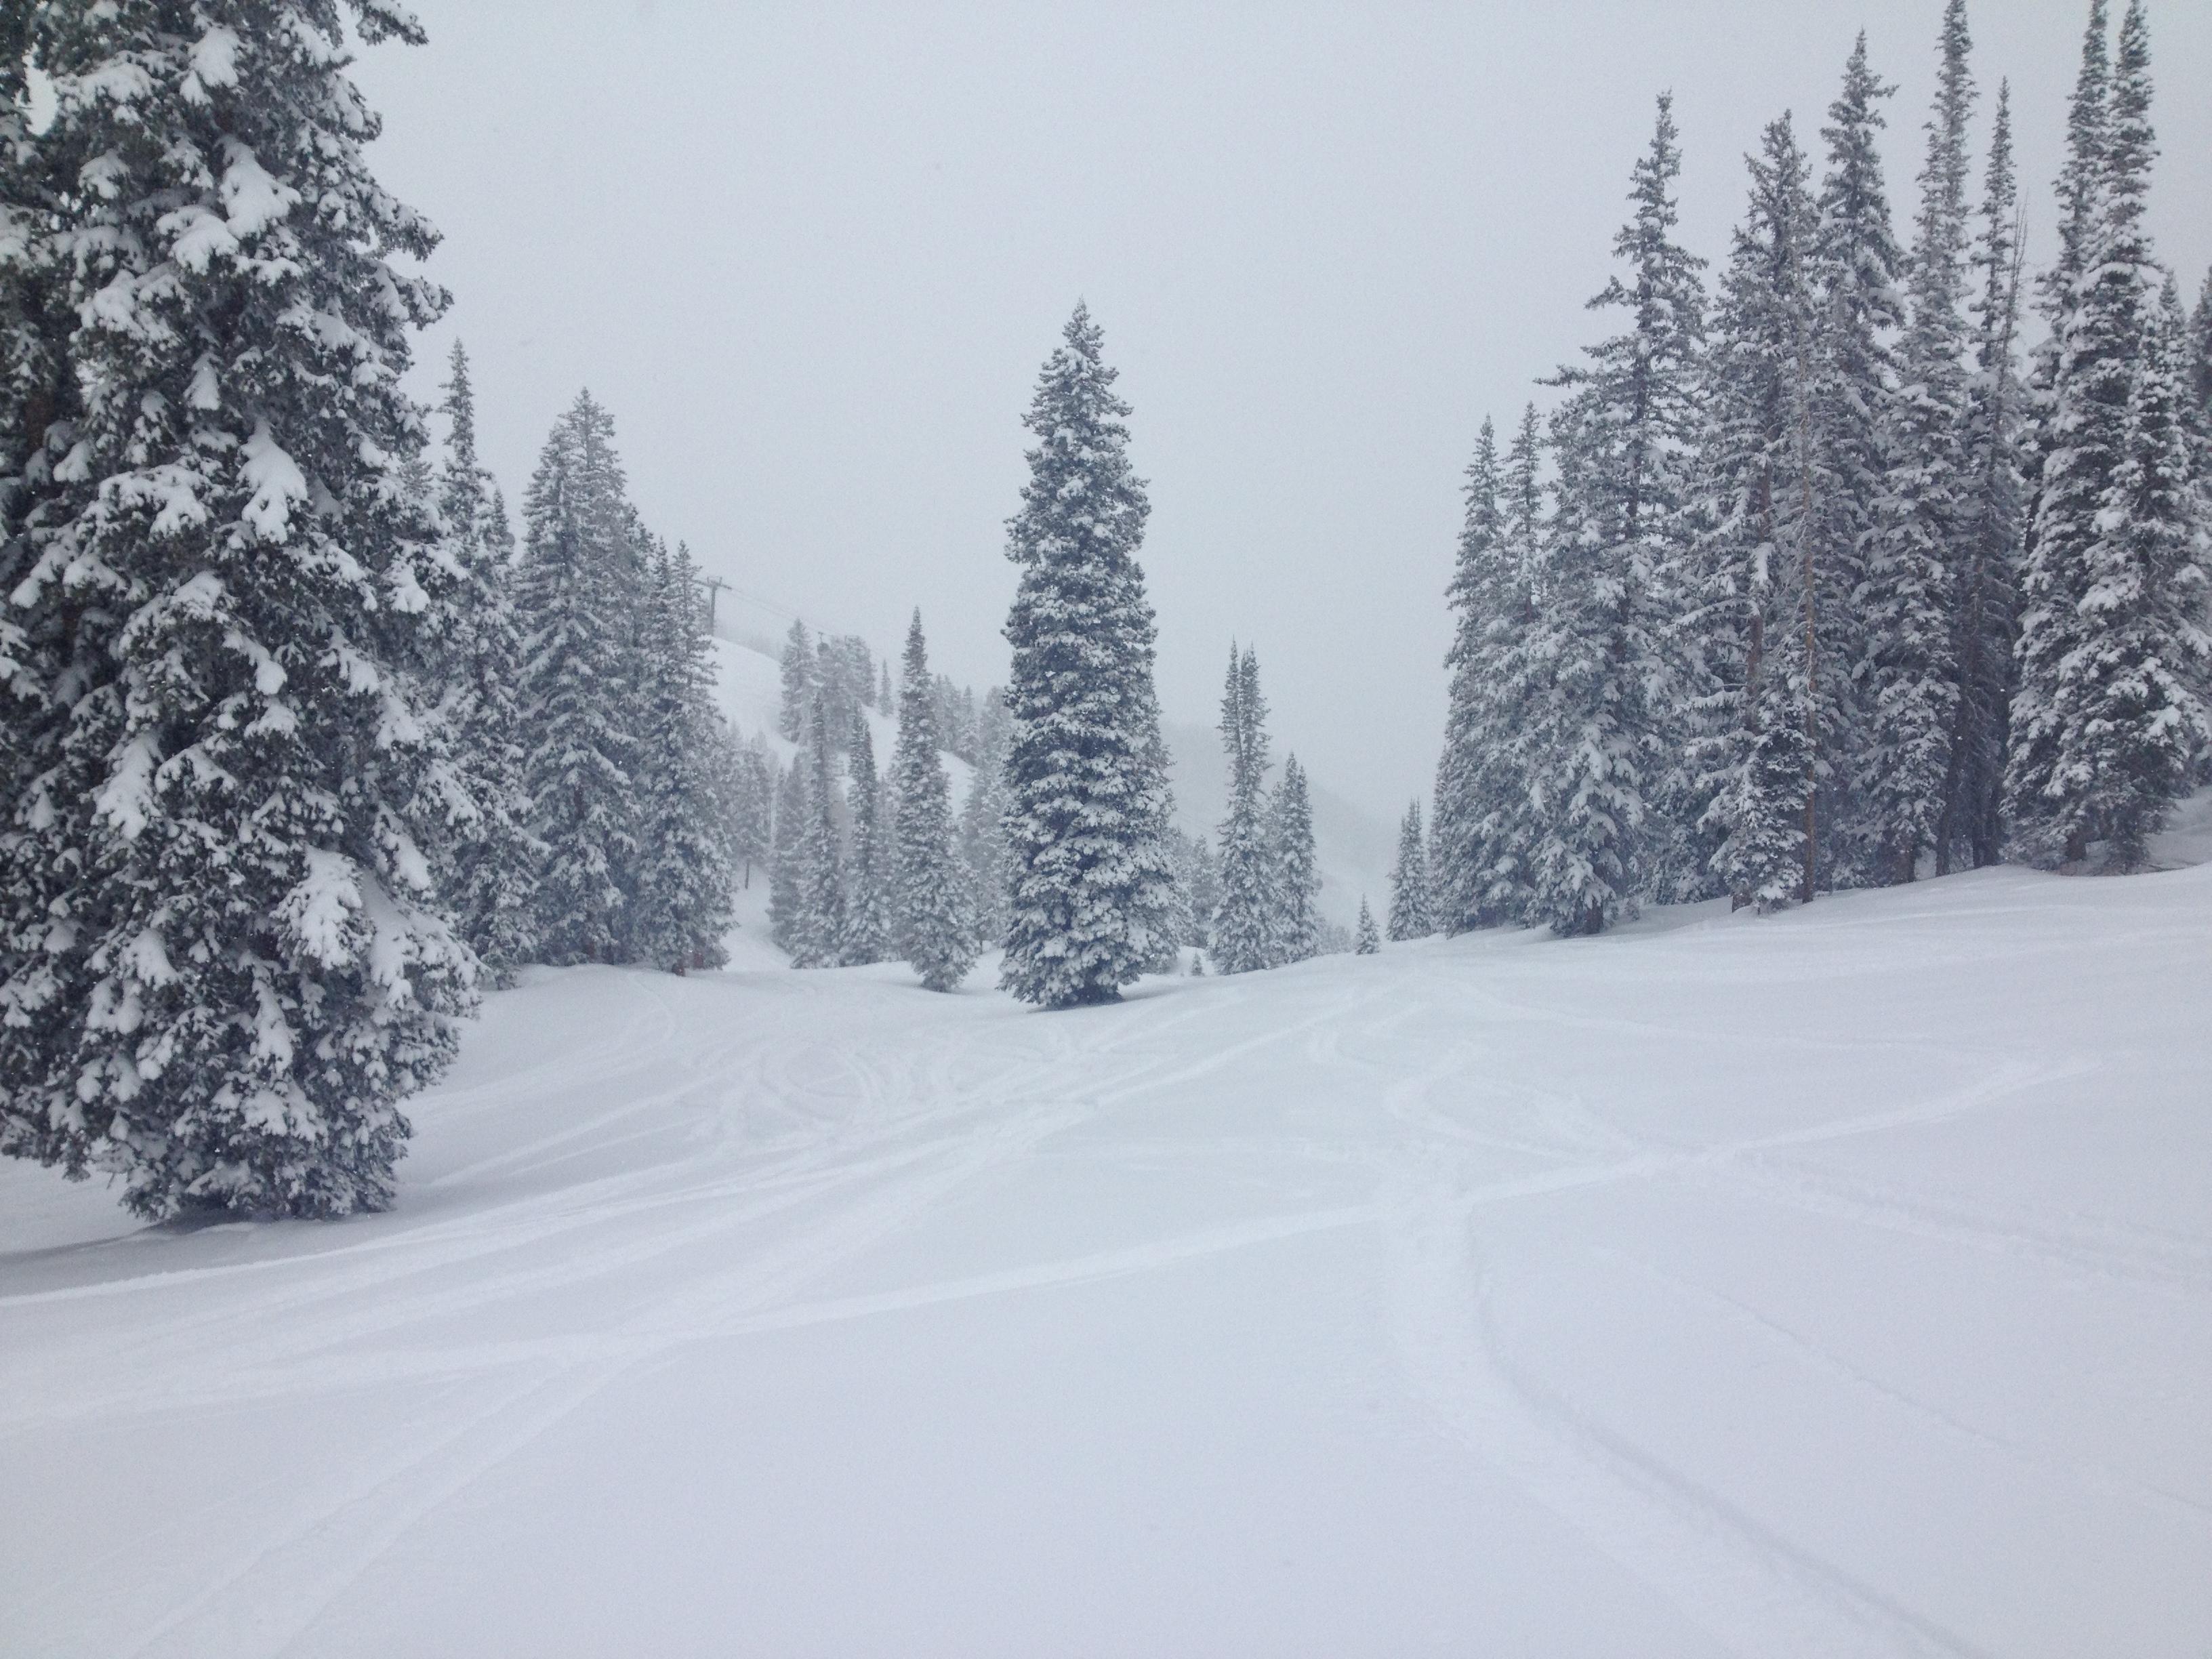 Aspen in Winter | My Favorite Things